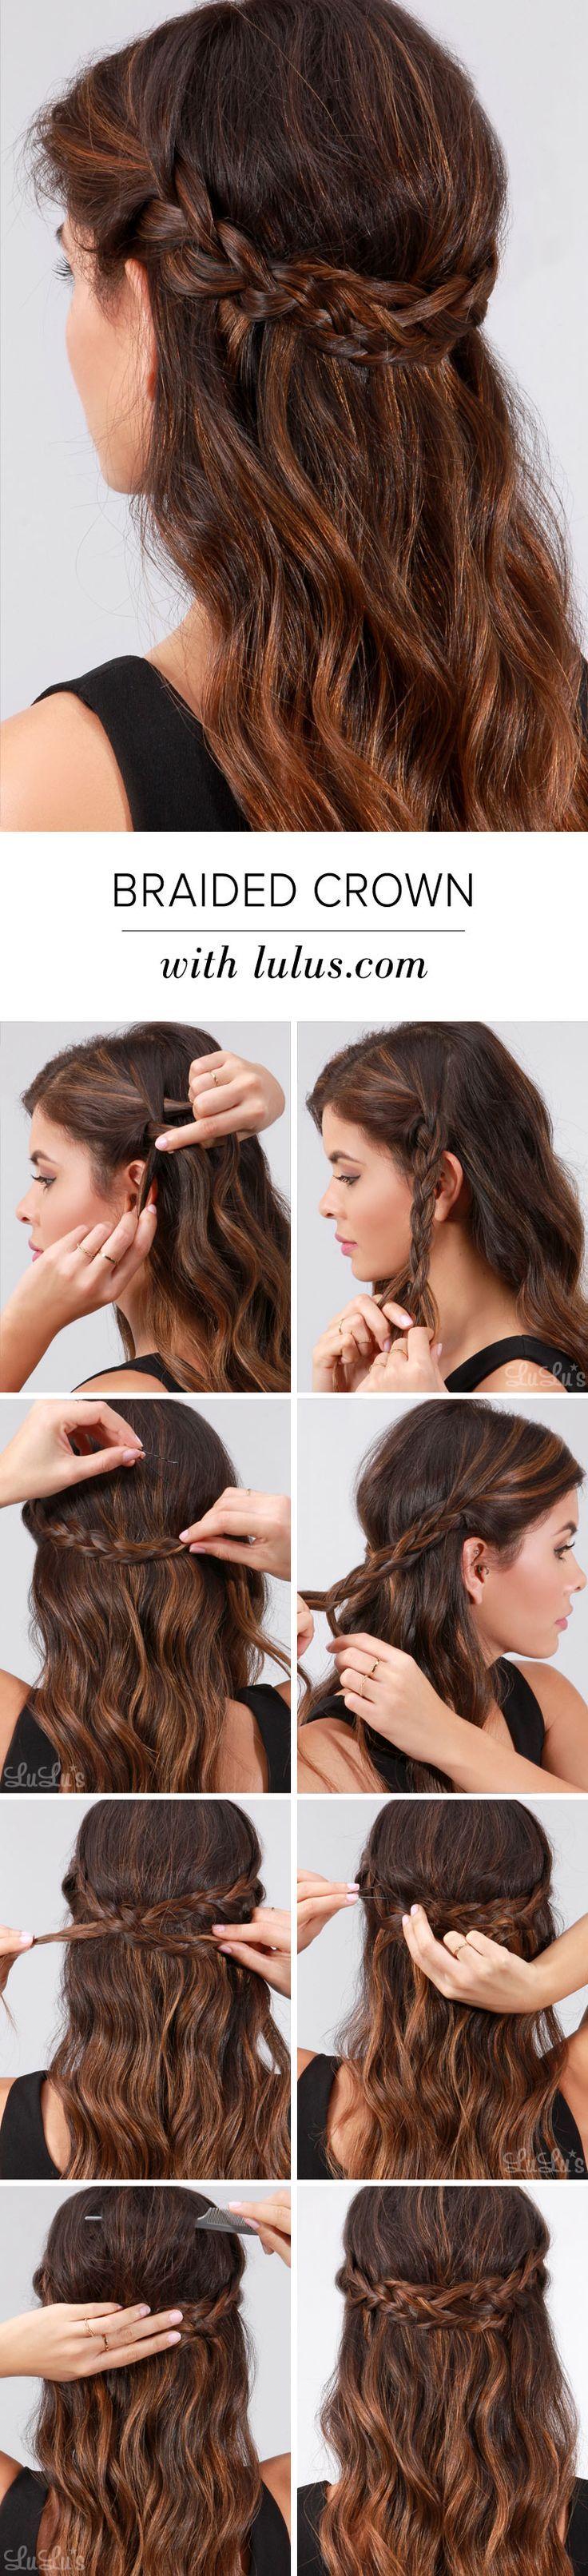 Super easy diy braided hairstyles for wedding tutorials long